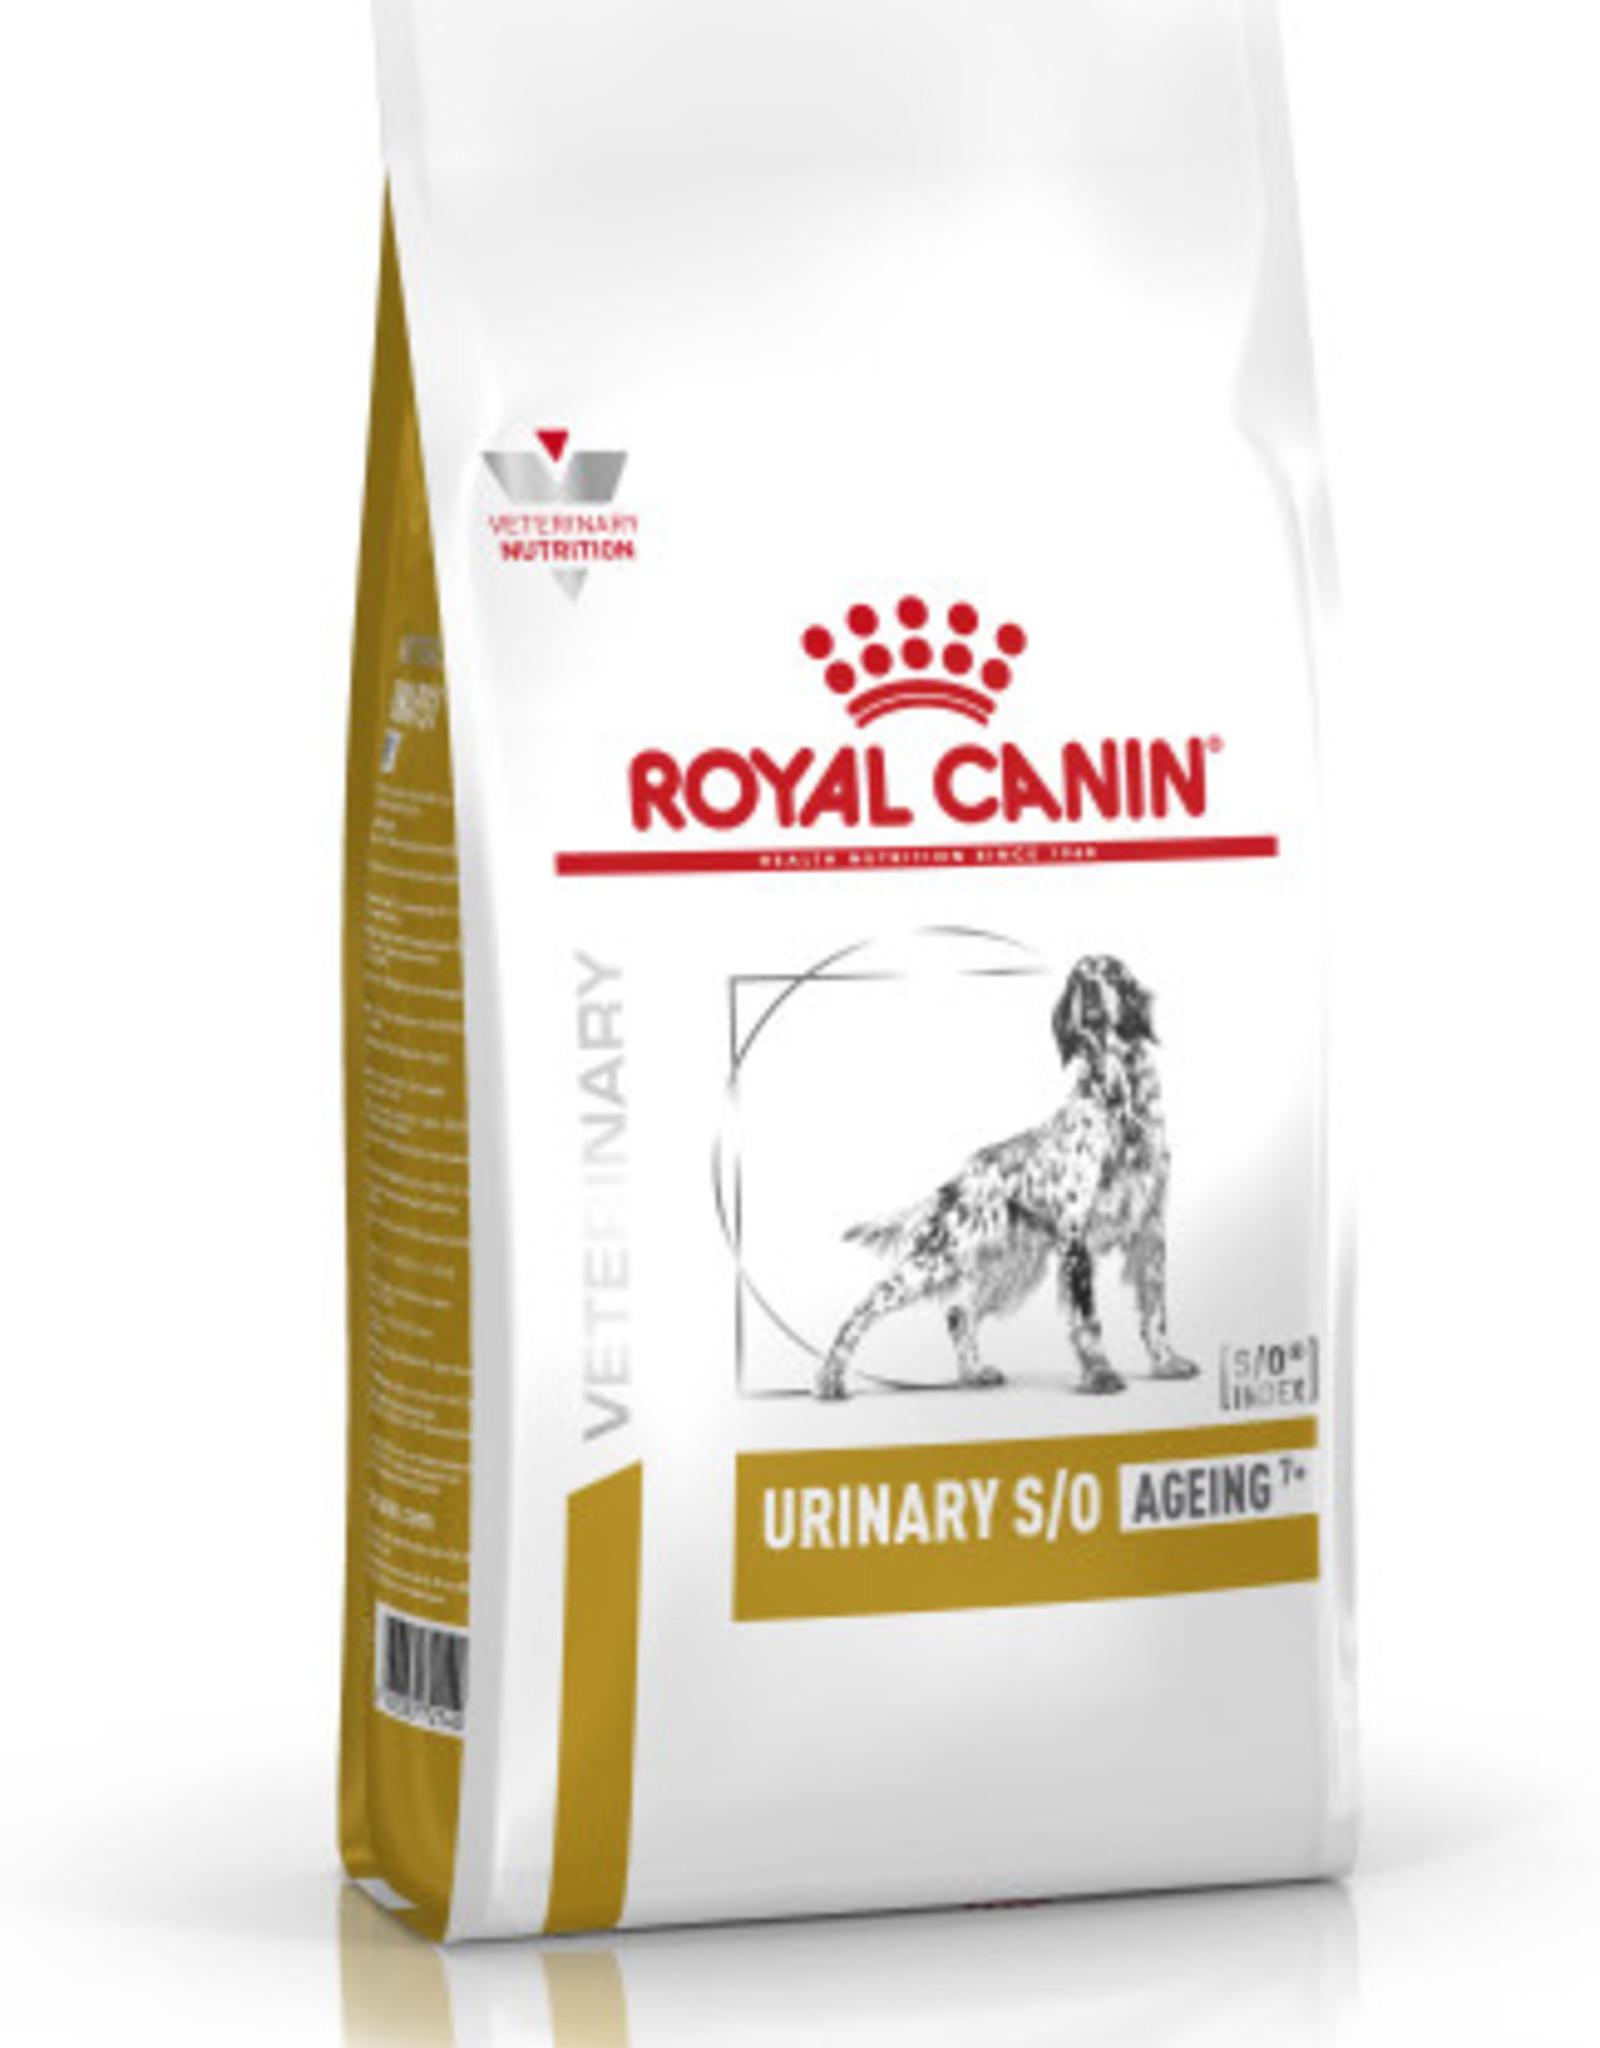 Royal Canin Royal Canin Urinary S/o Ageing Hond 1,5kg